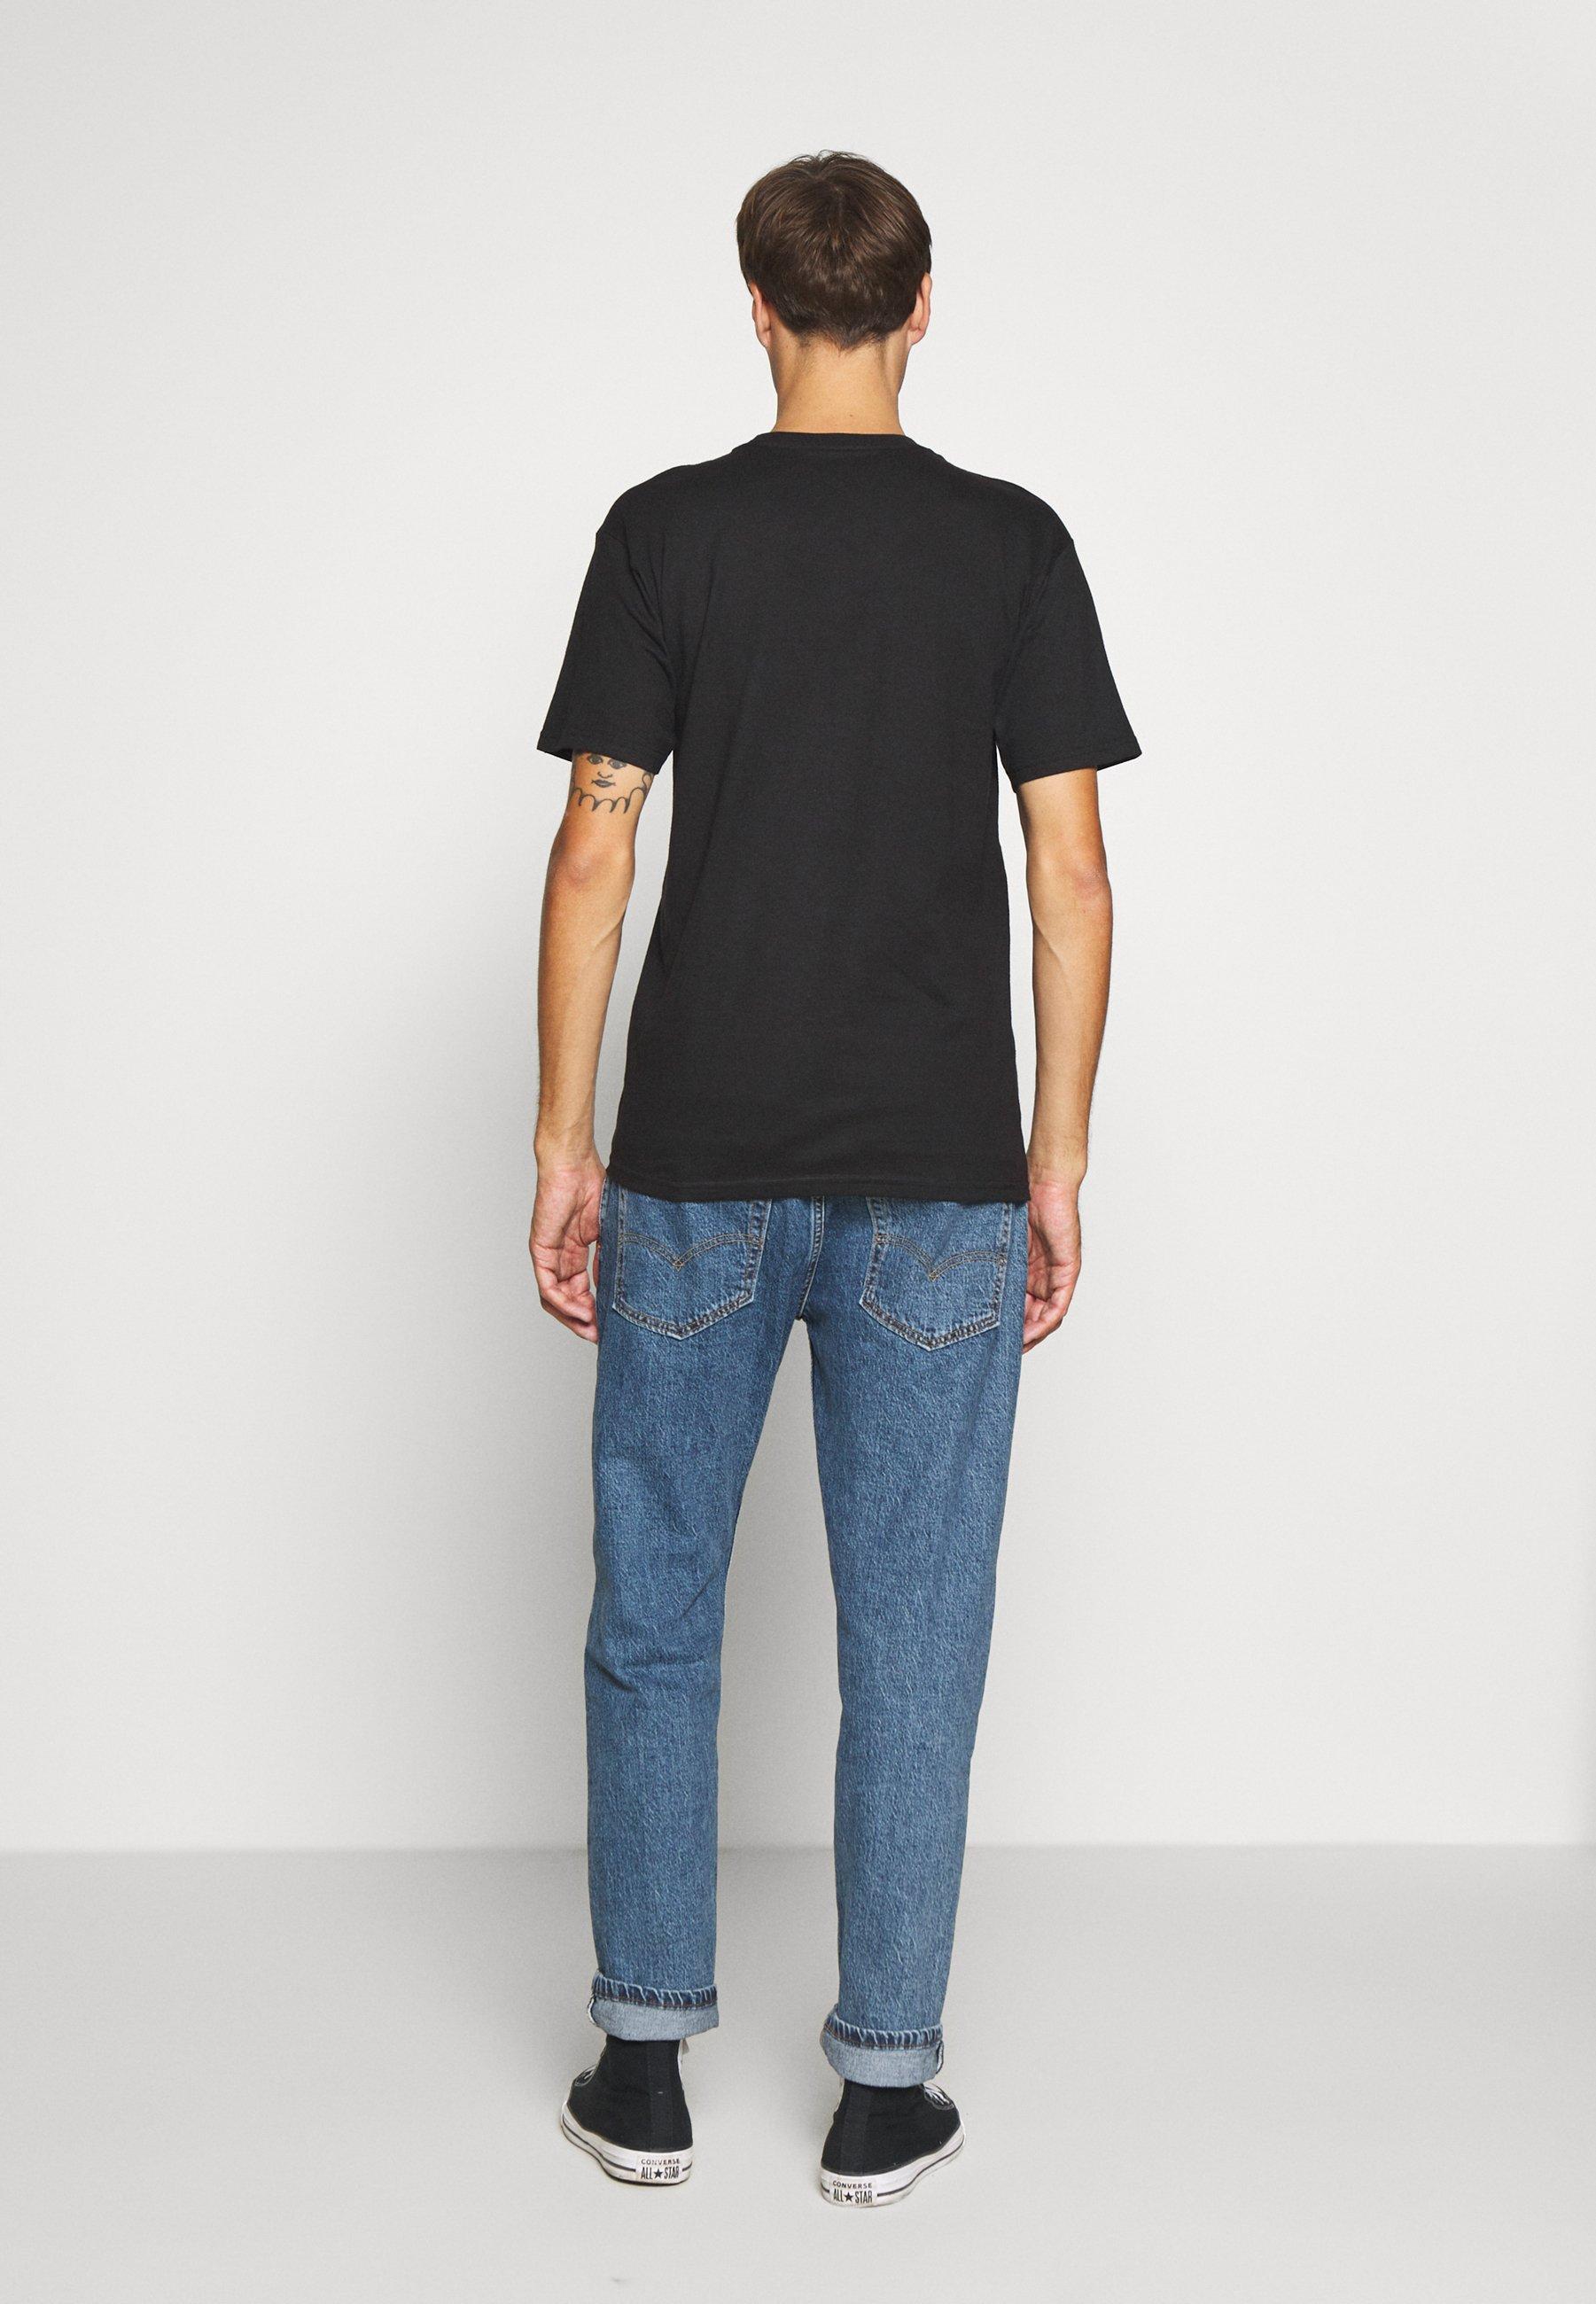 Diamond Supply Co. Calavera Tee - T-shirt Print Black